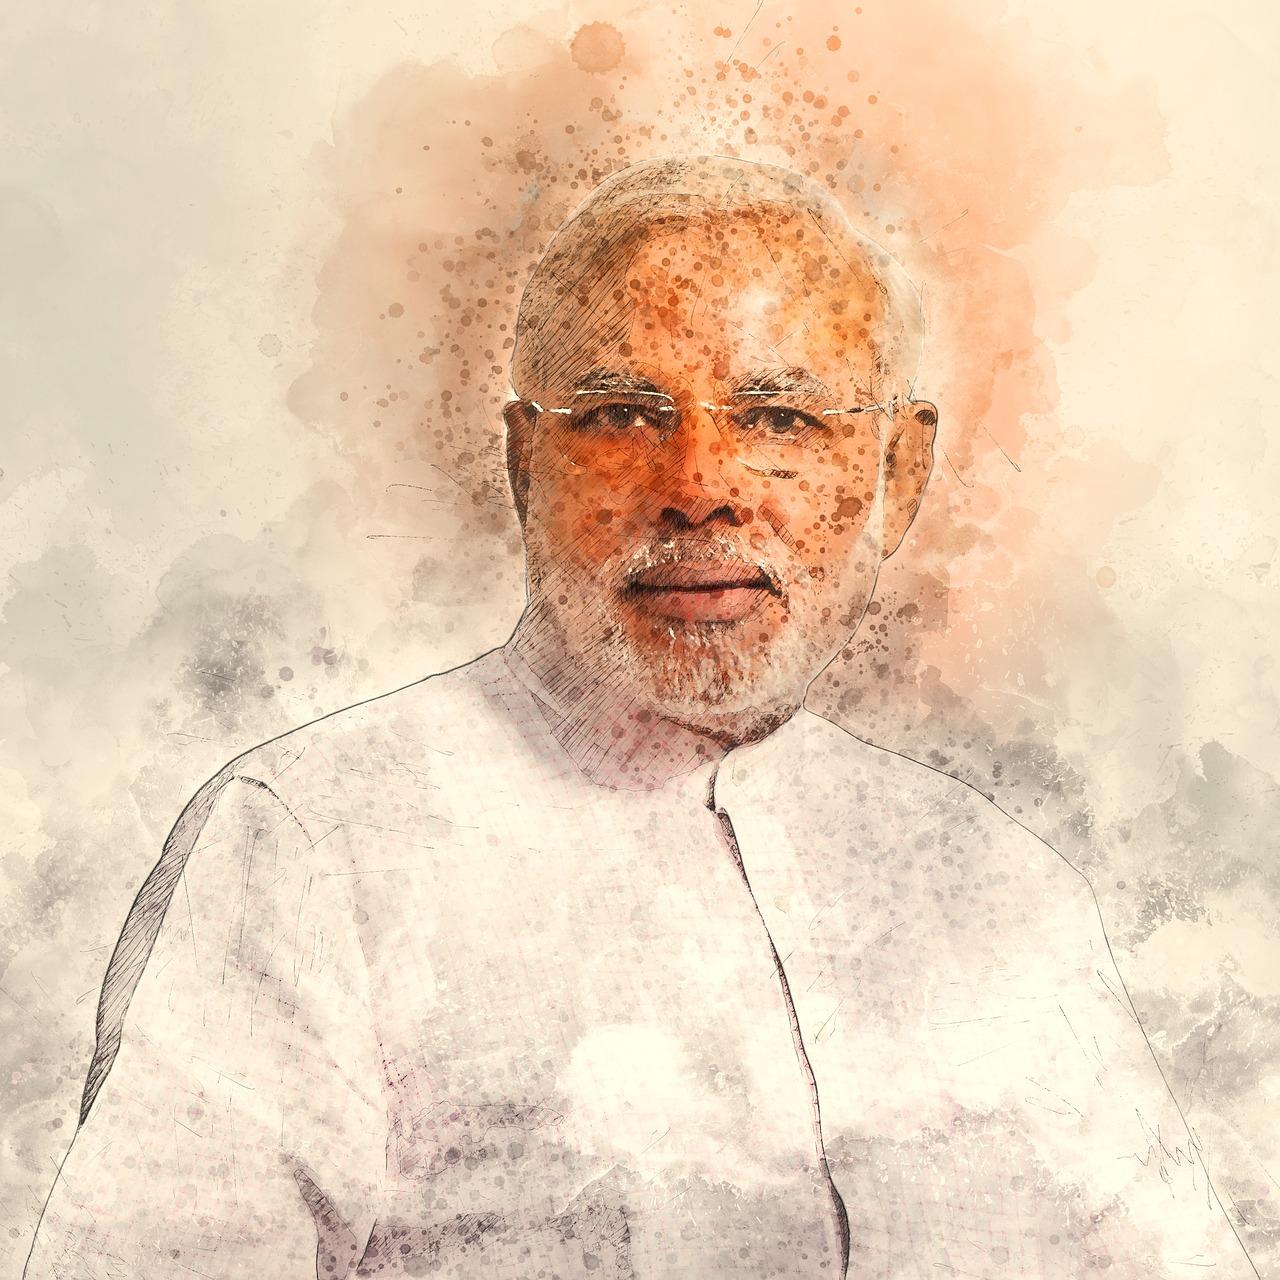 भारत के प्रधानमंत्री